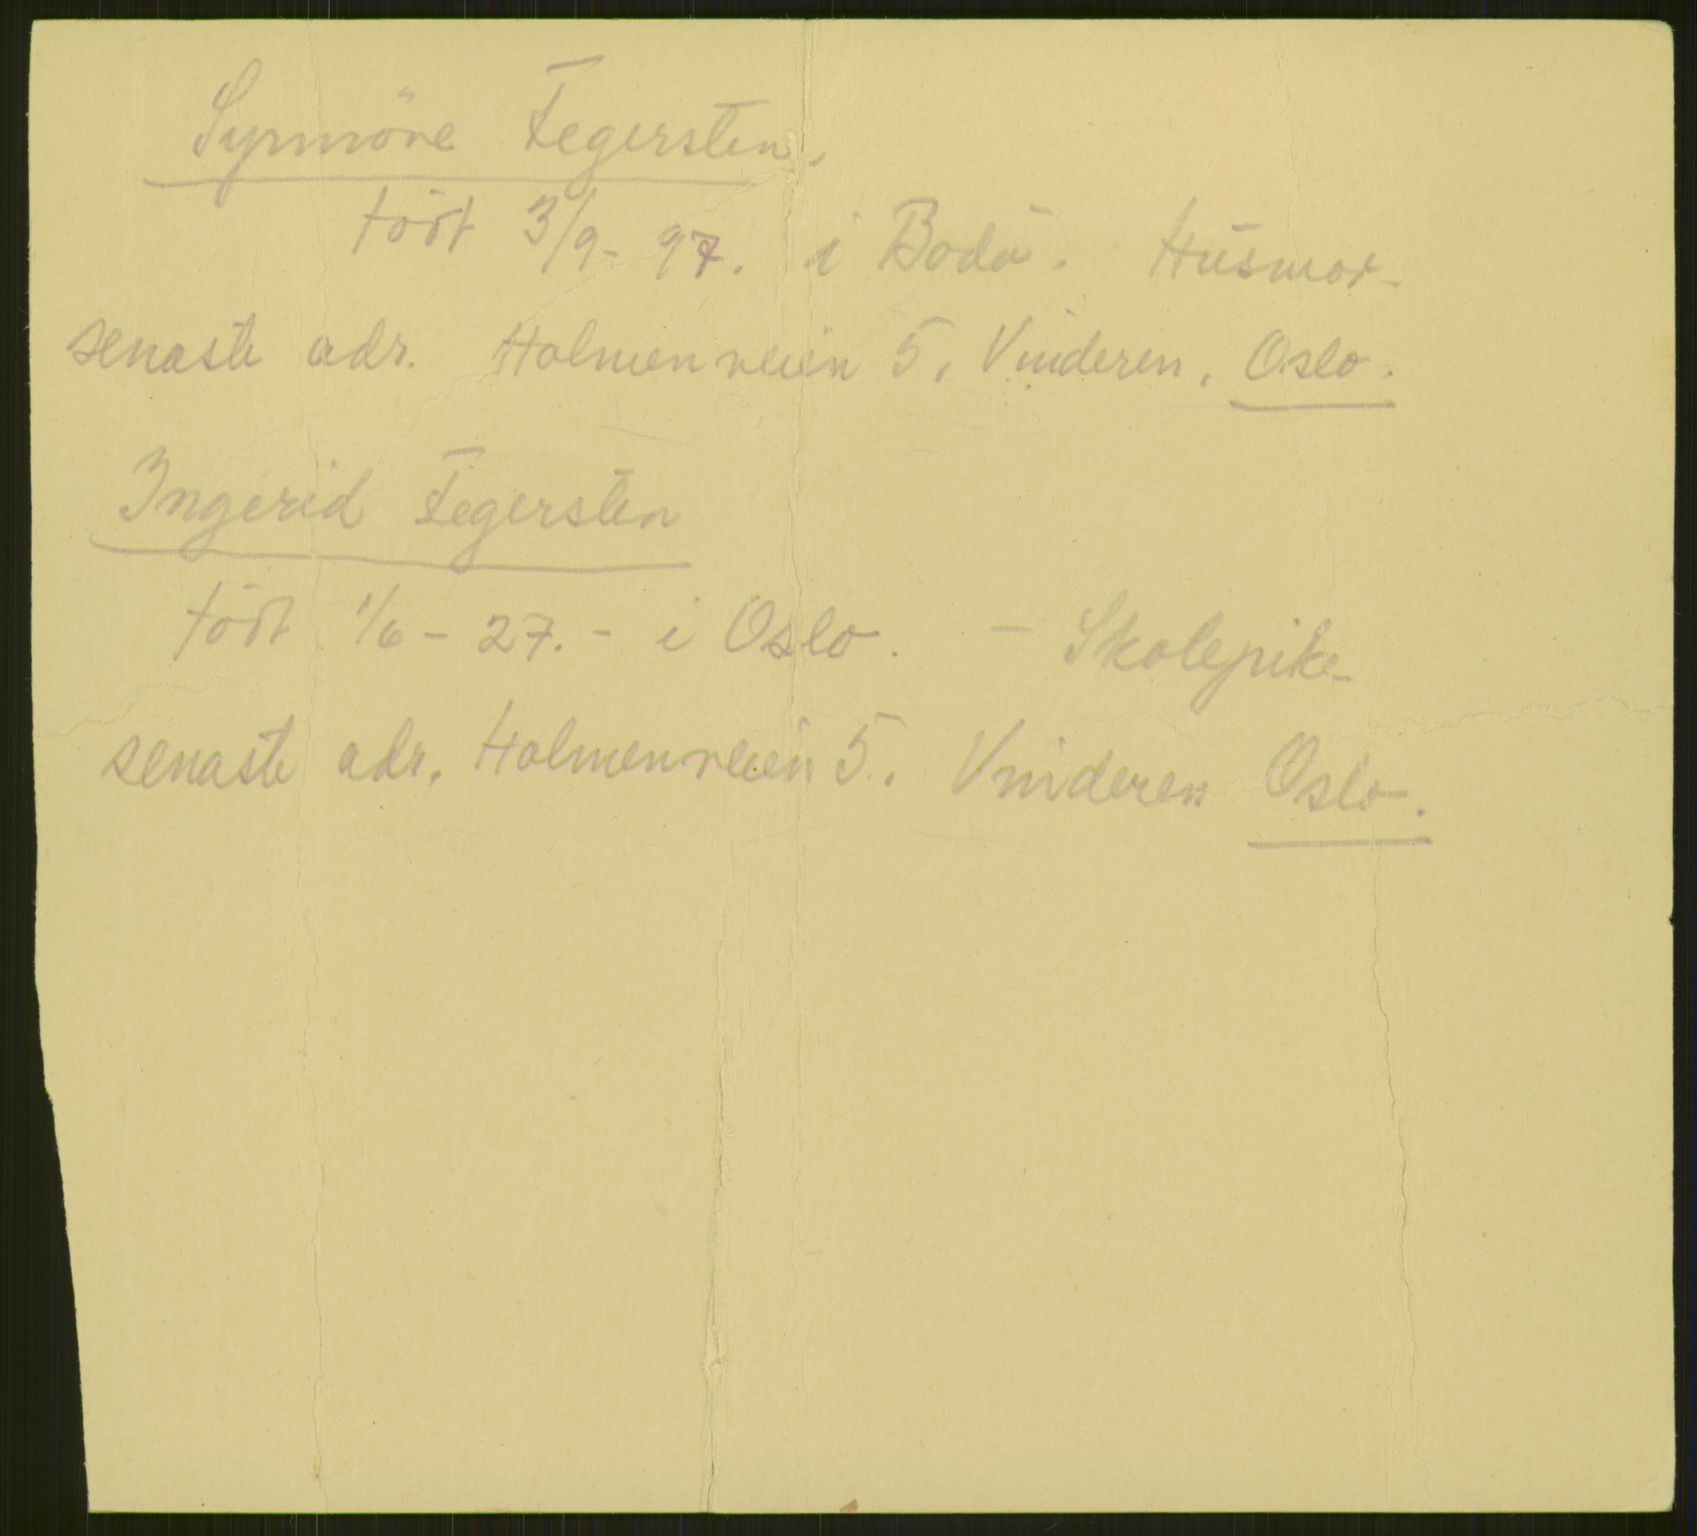 RA, Henry Wennberg, 1943, p. 1